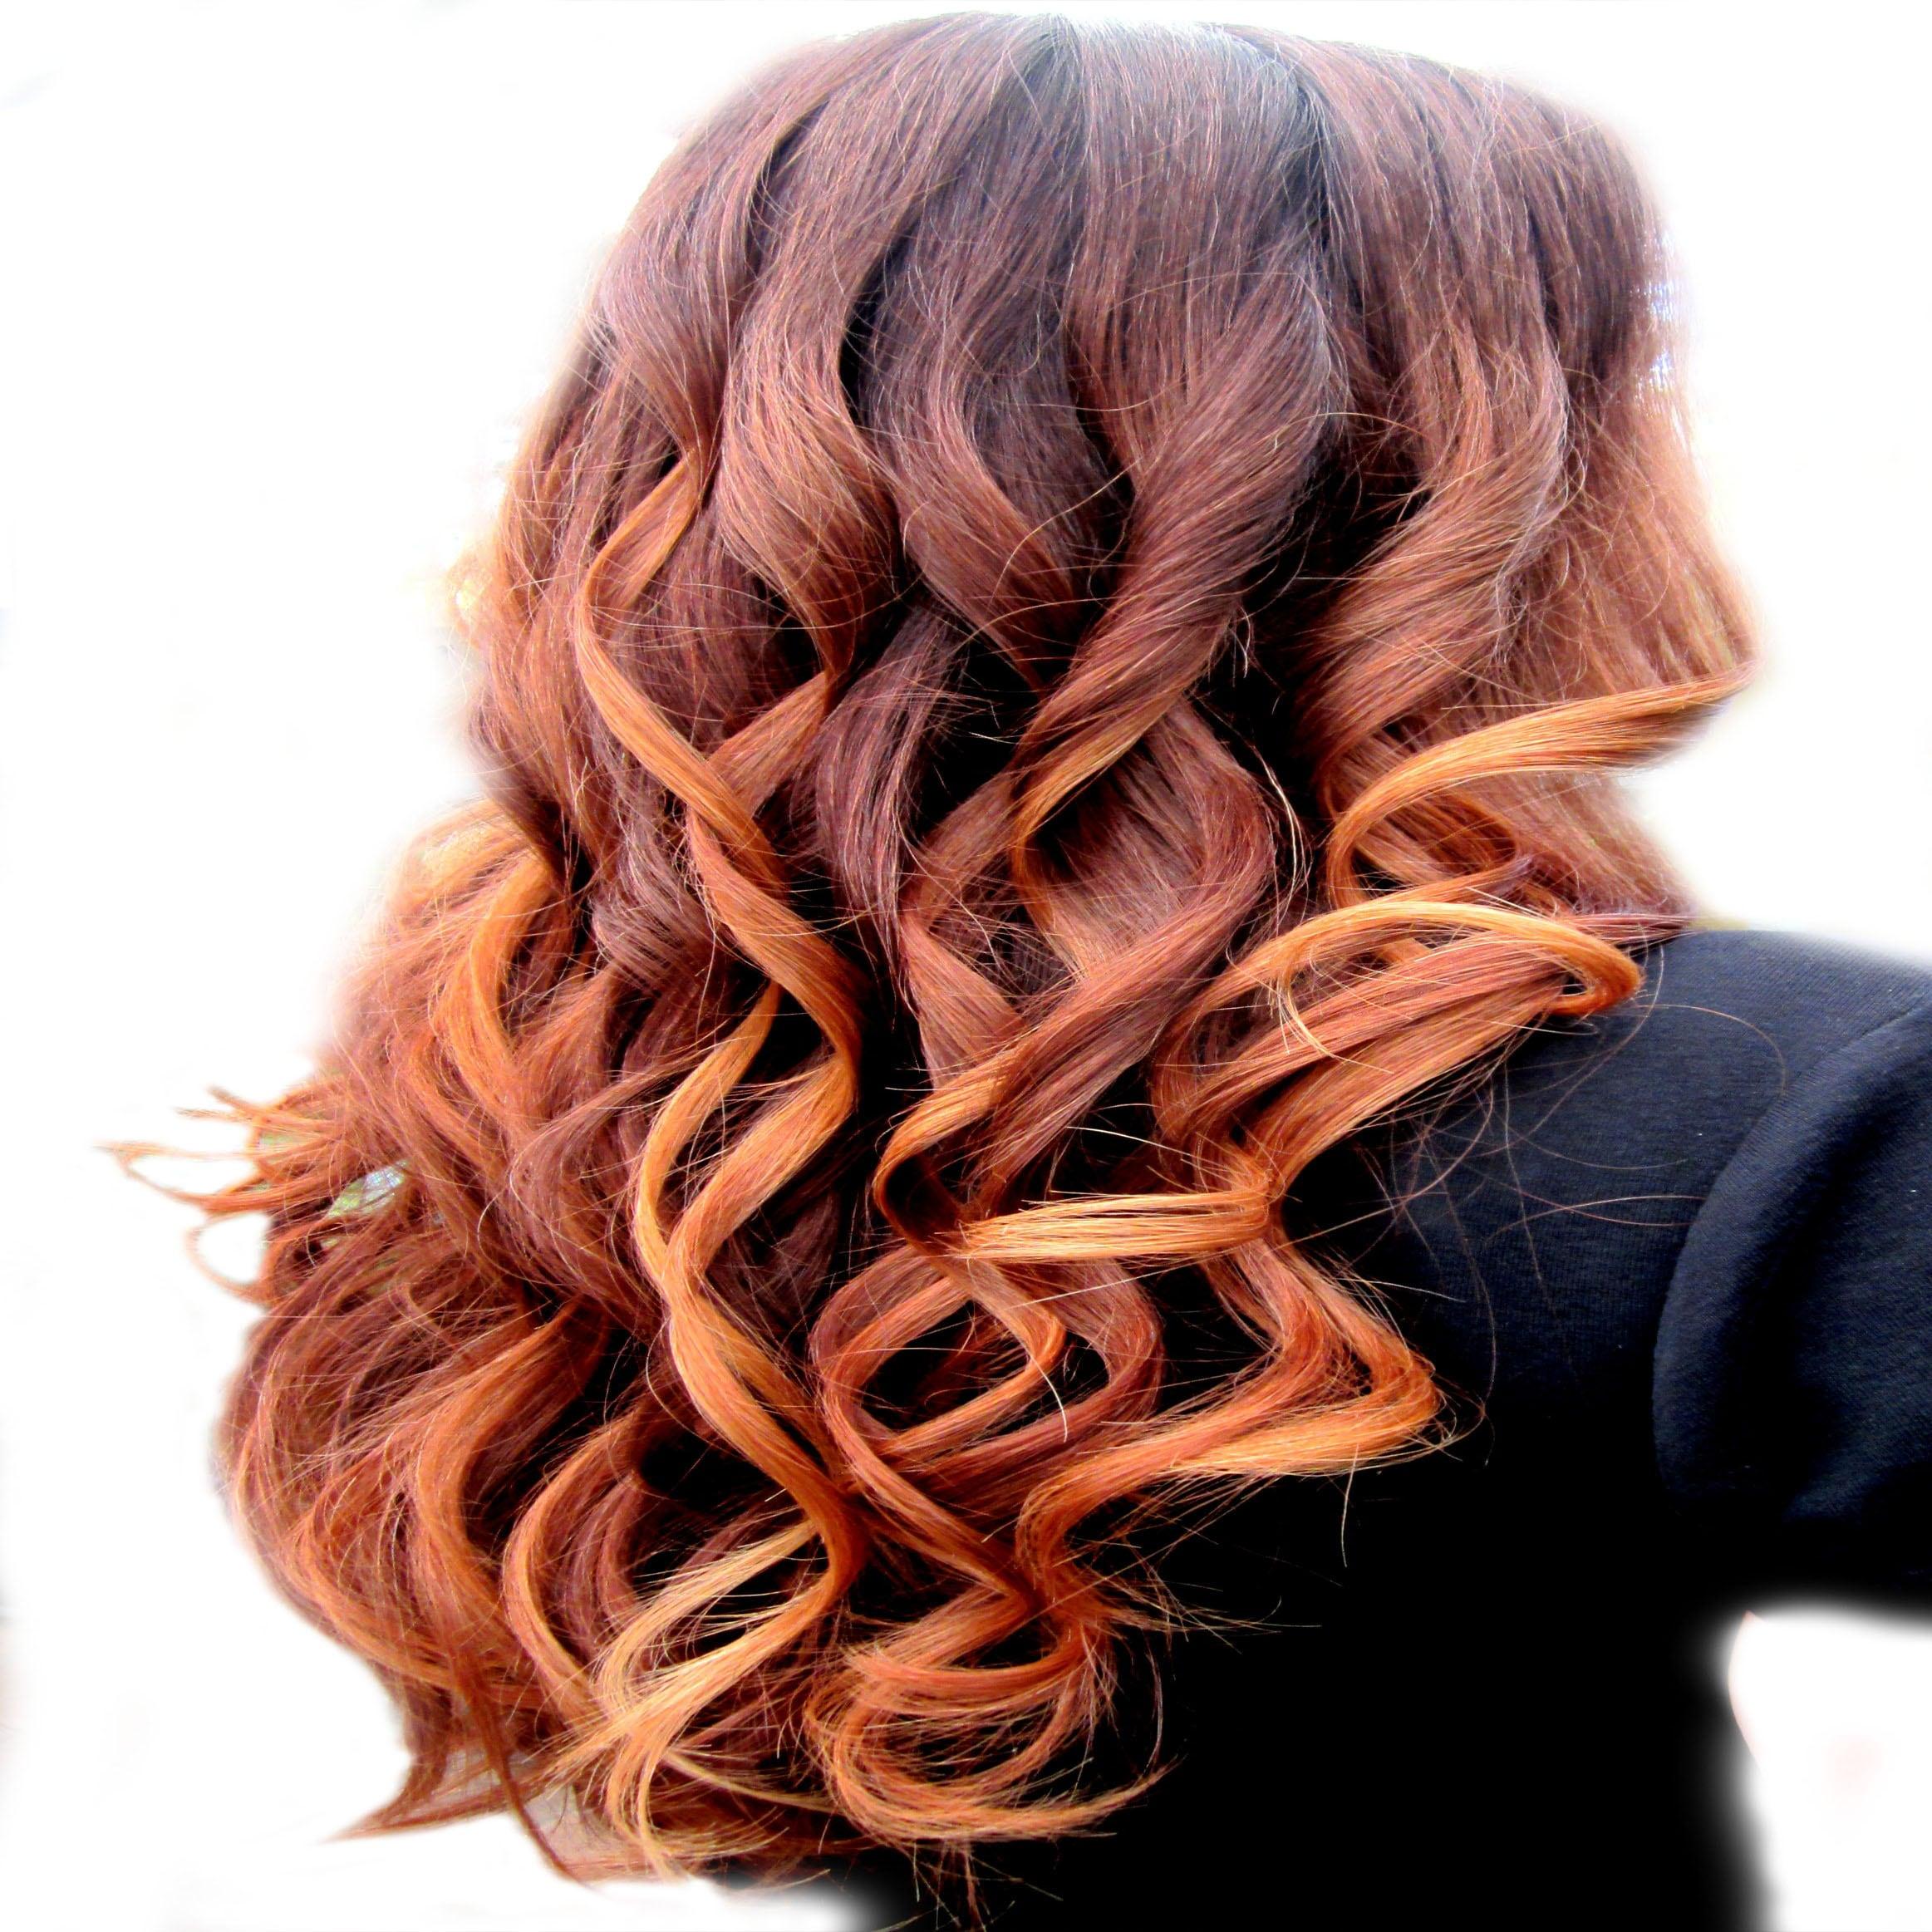 Salz Hair And Beauty Hairdressers Glenelg East